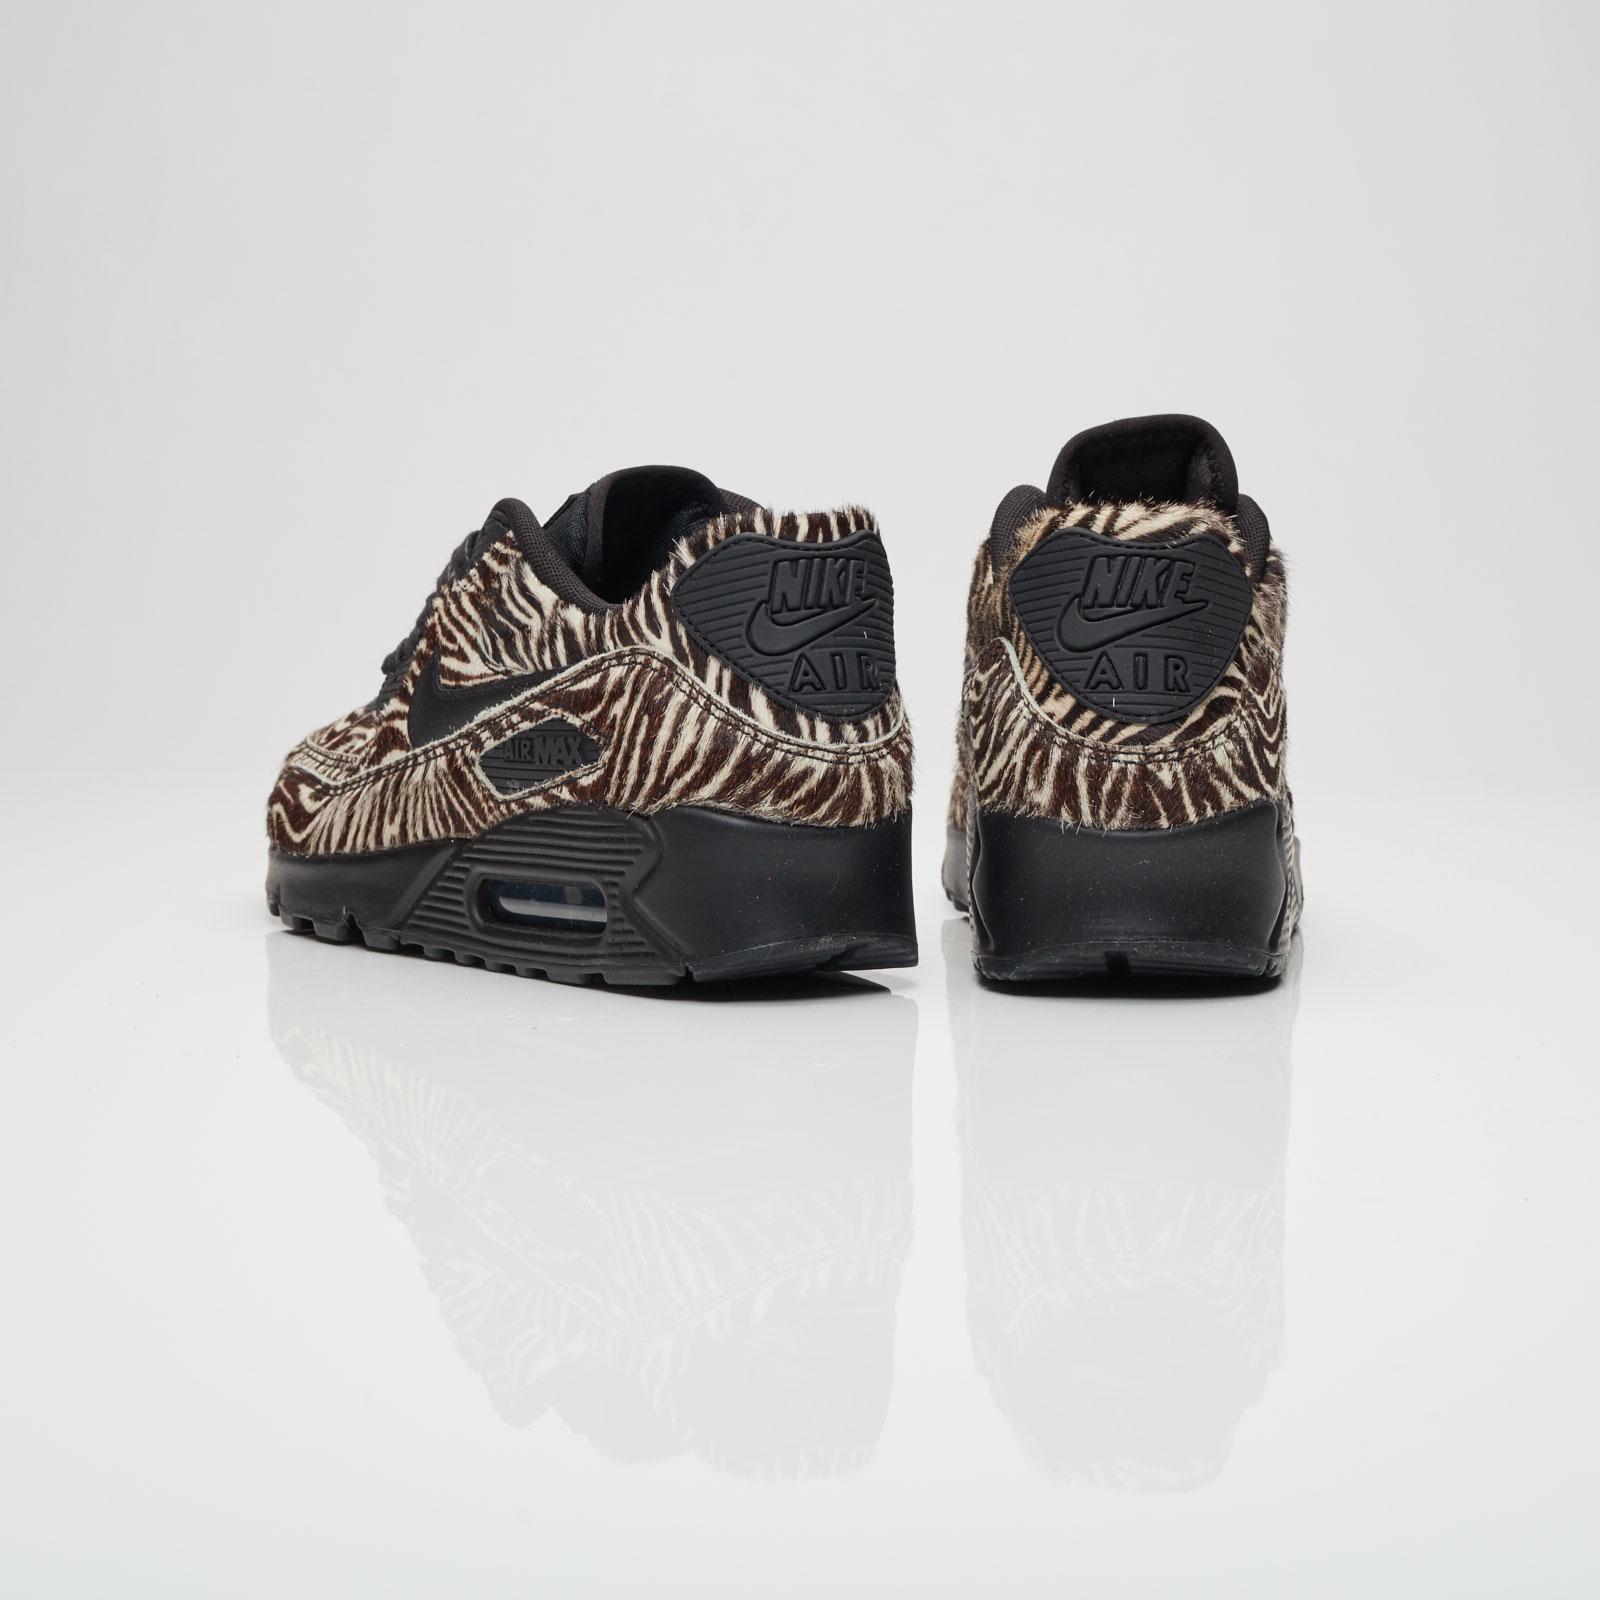 e2536ab6d913 Nike Wmns Air Max 90 Lx - 898512-001 - Sneakersnstuff